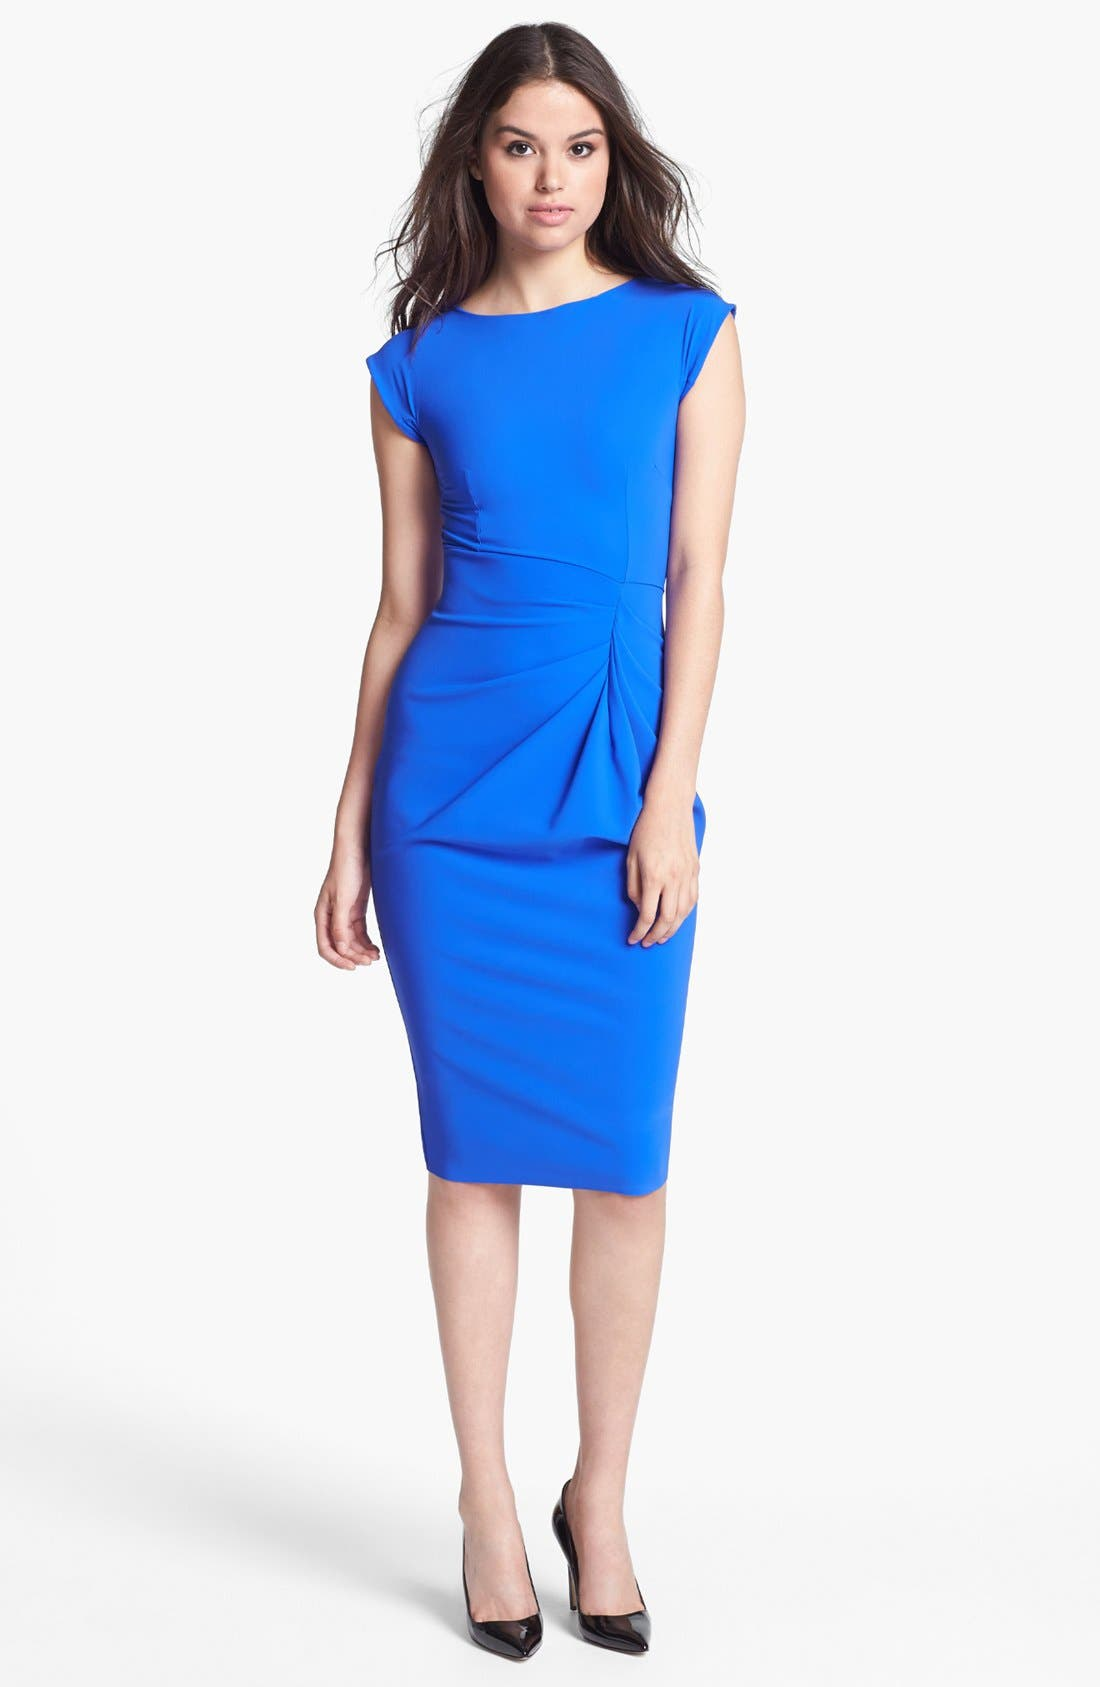 Alternate Image 1 Selected - La Petite Robe by Chiara Boni Side Pleat Pencil Dress